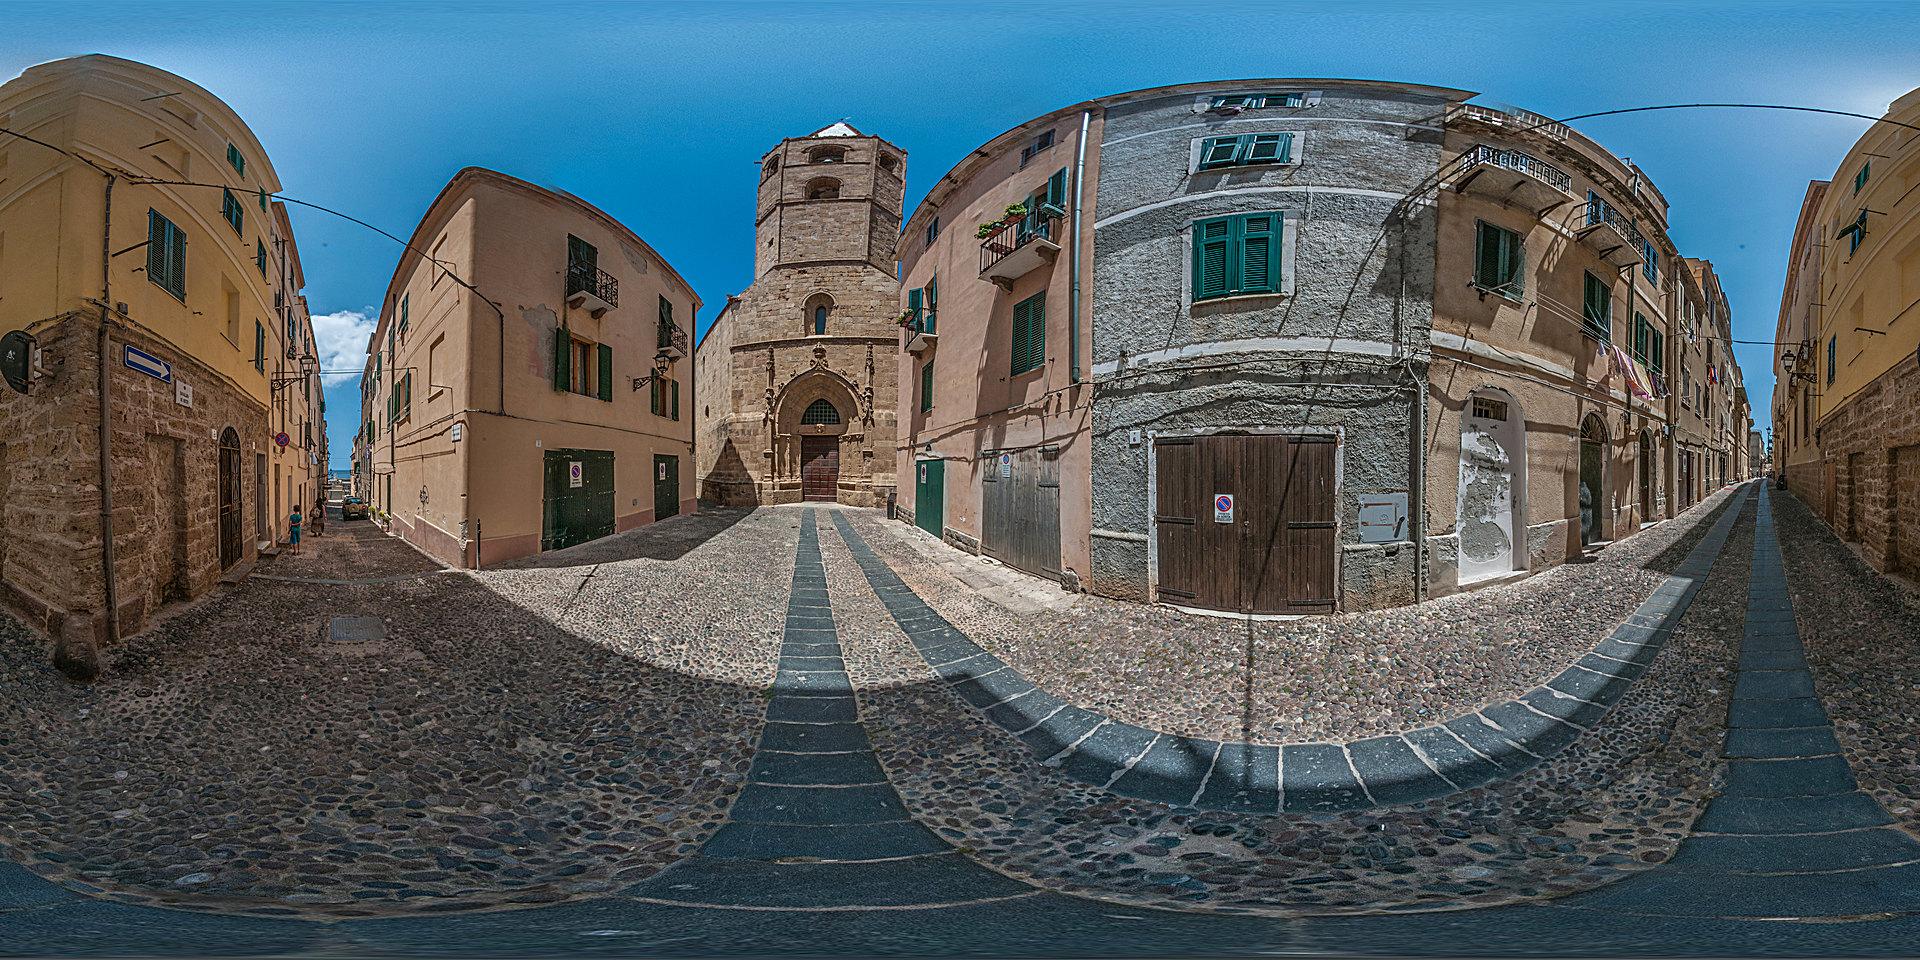 Sardinien, Alghero: Kathedrale Santa Maria